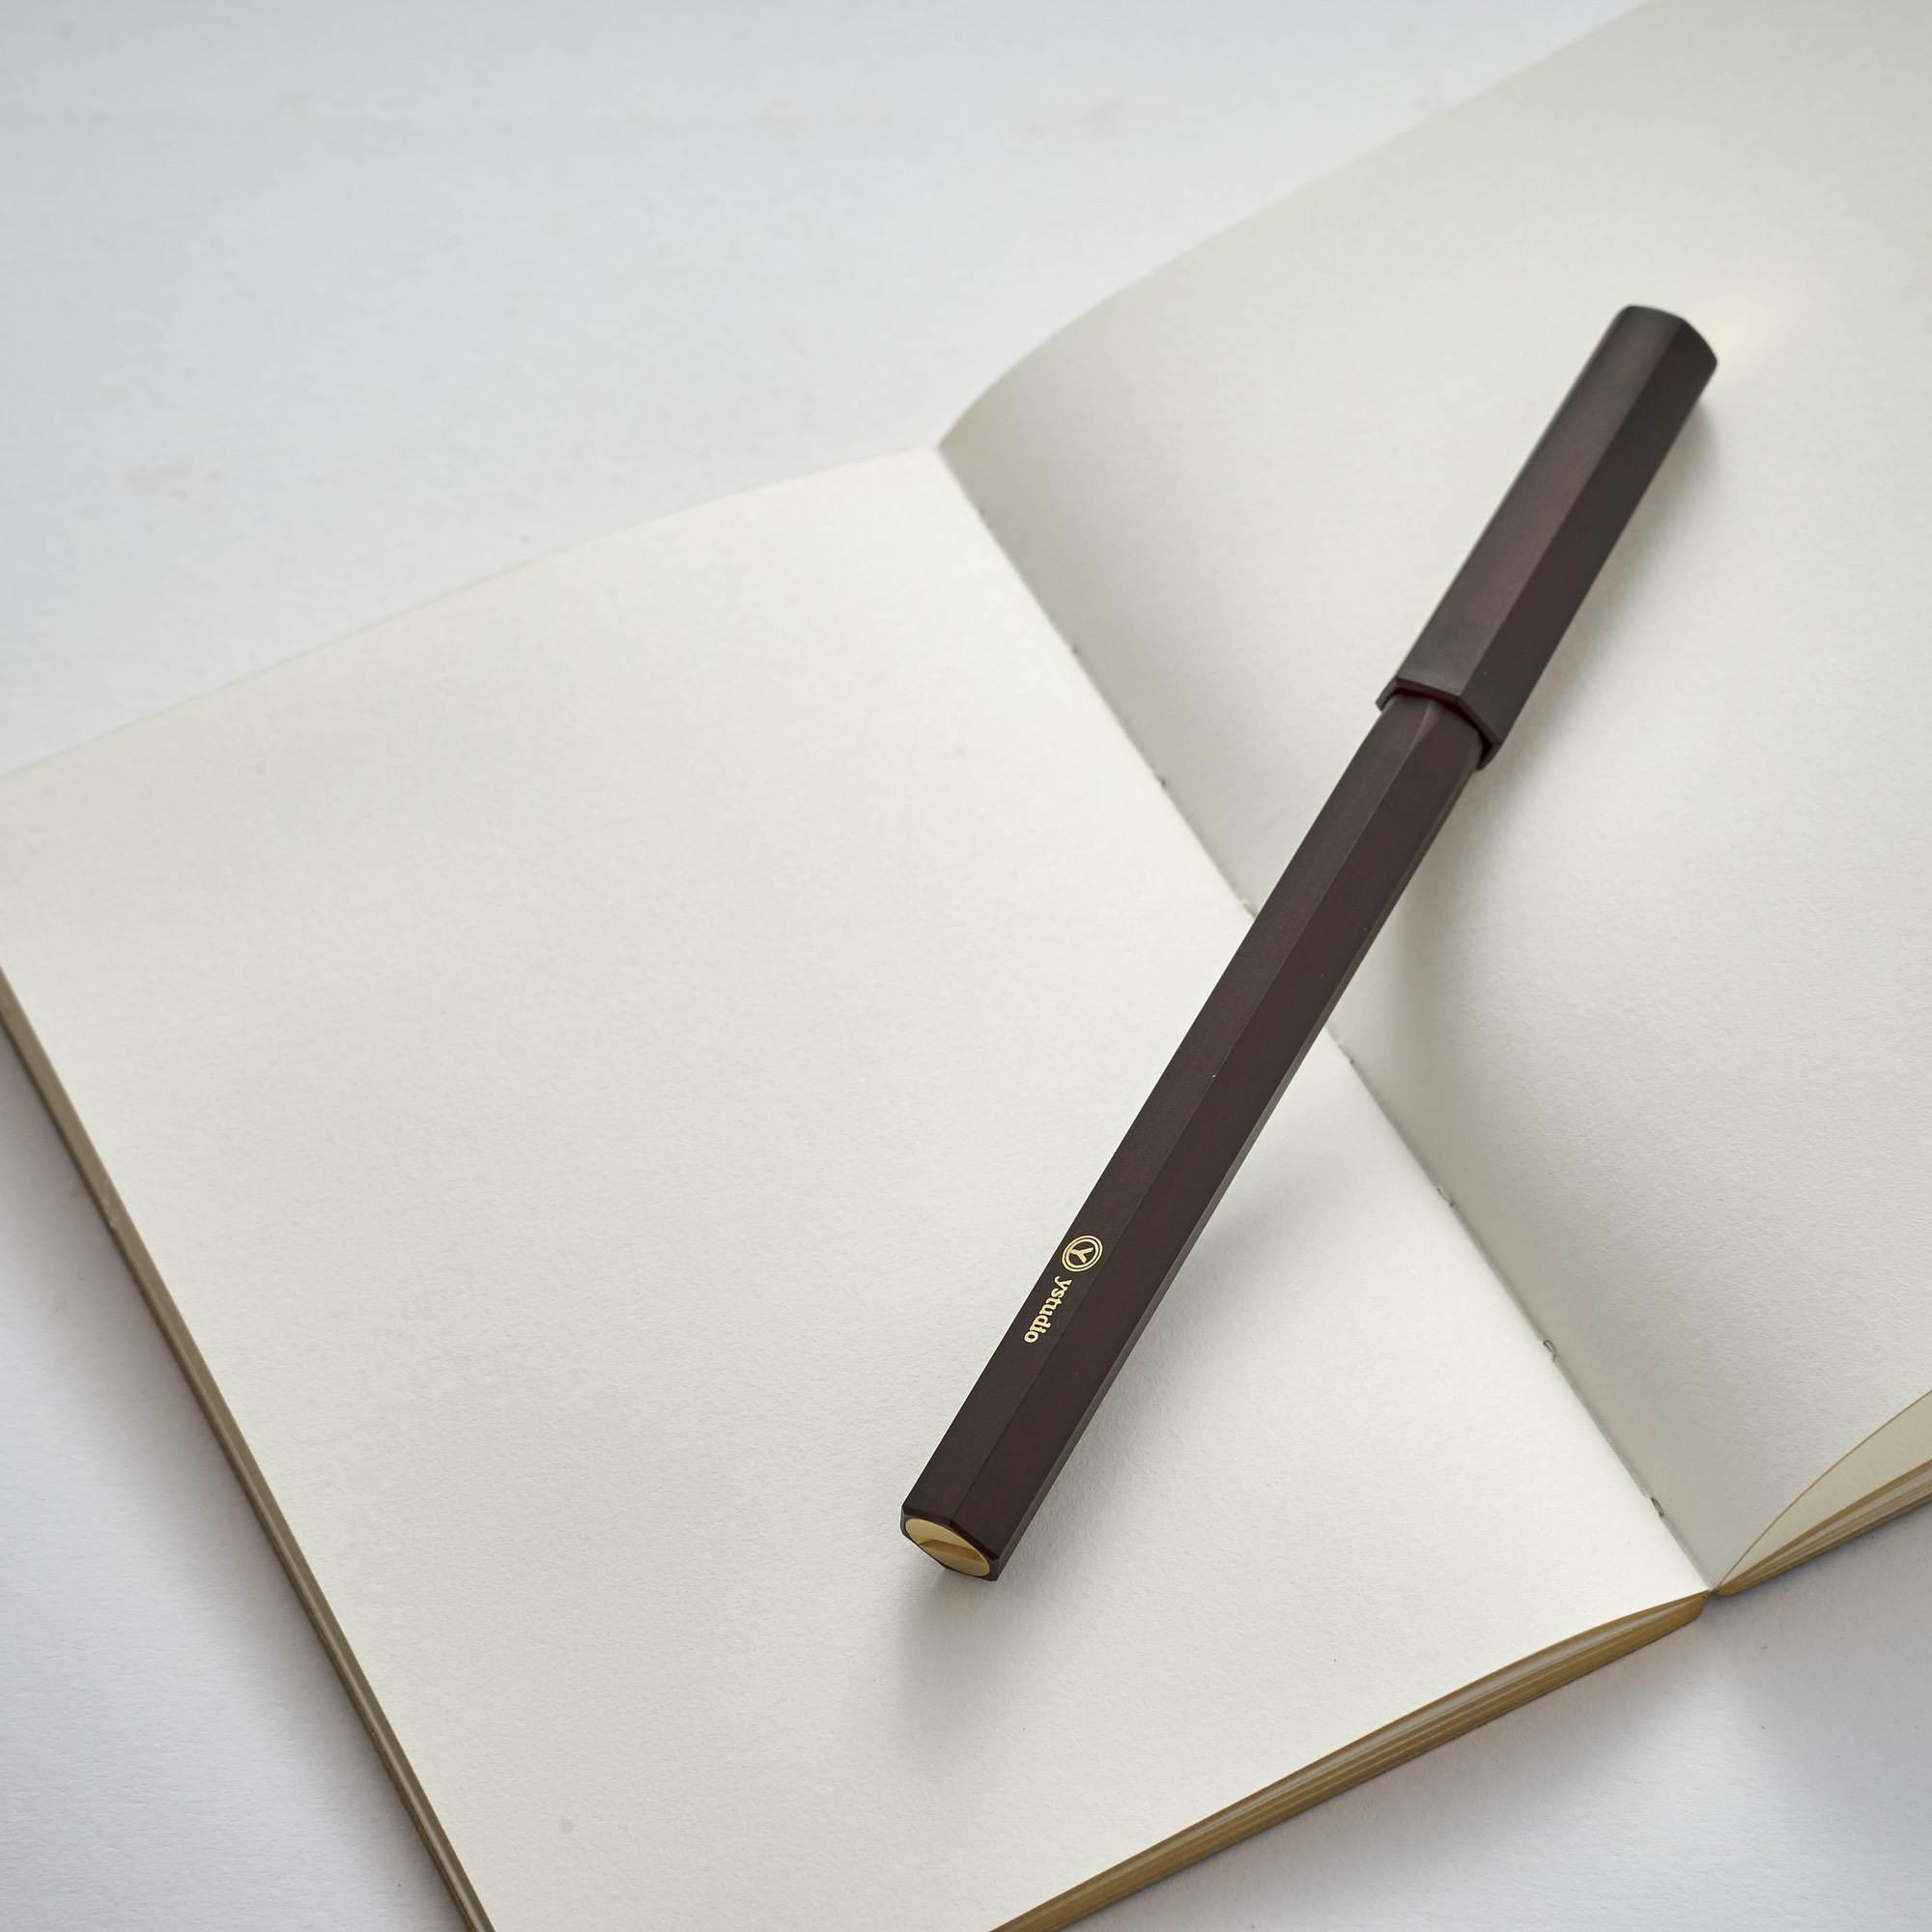 YStudio Ручка-роллер Resin Rollerball Pen Black